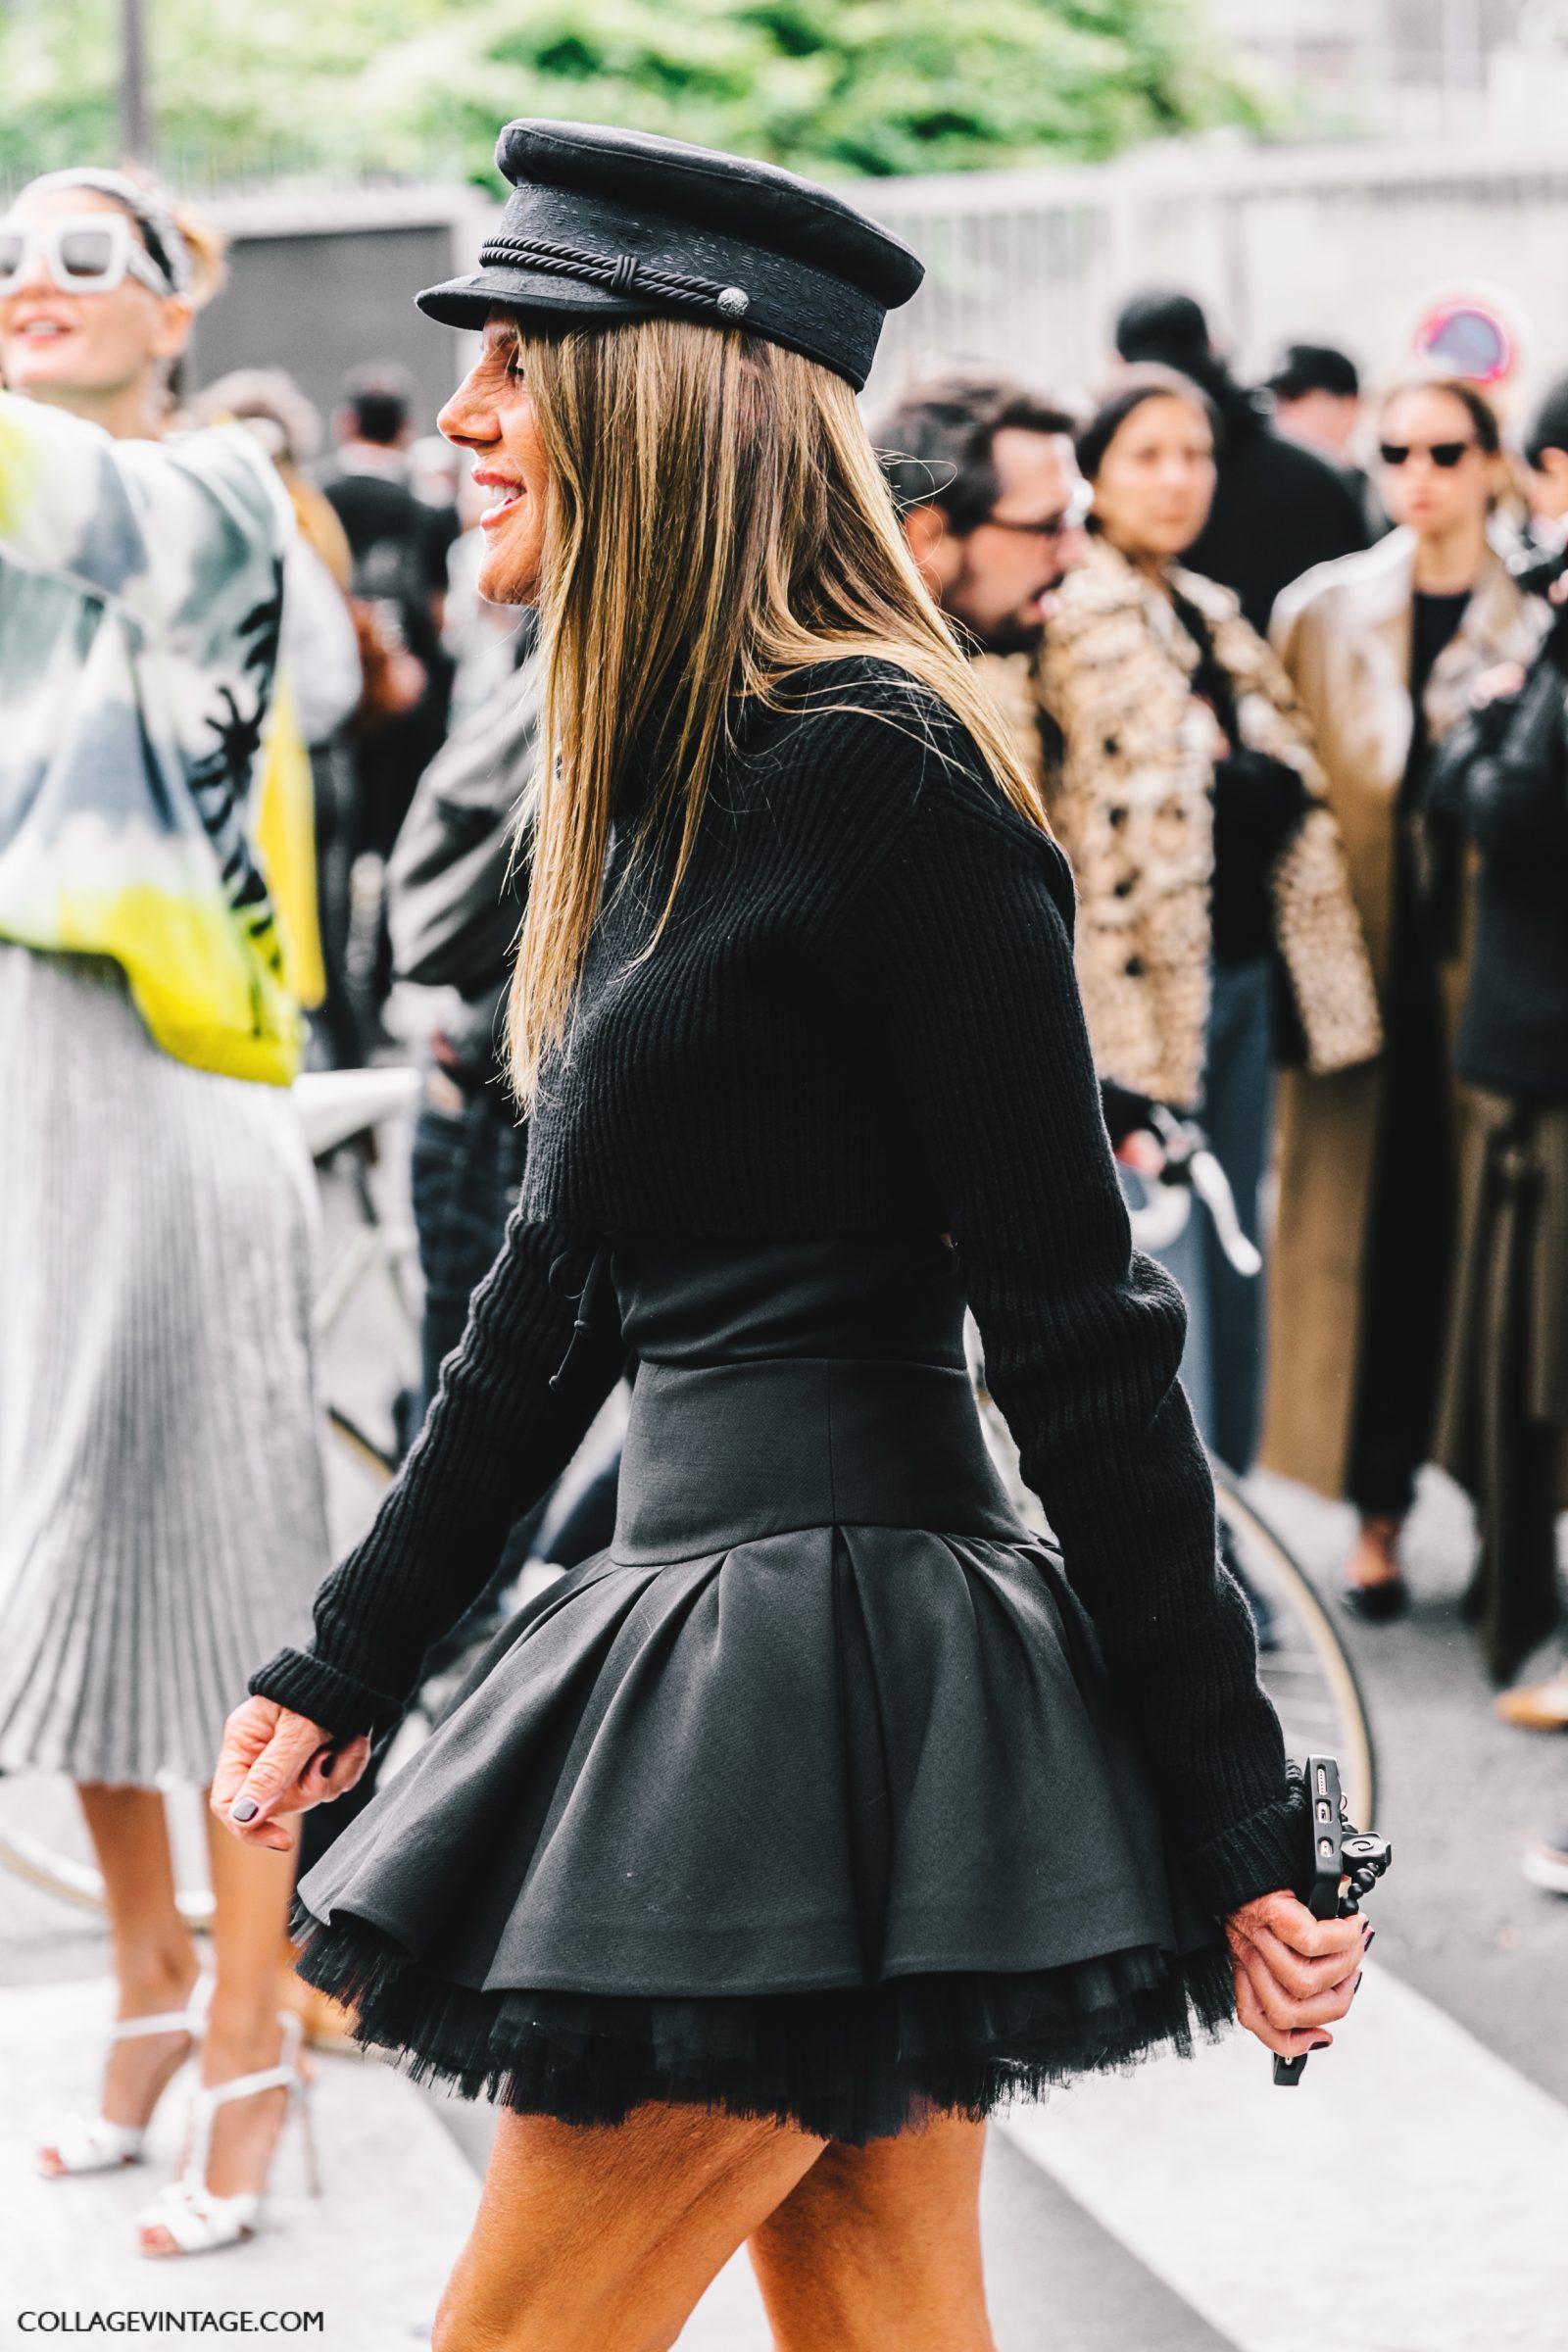 pfw-paris_fashion_week_ss17-street_style-outfits-collage_vintage-valentino-balenciaga-celine-36